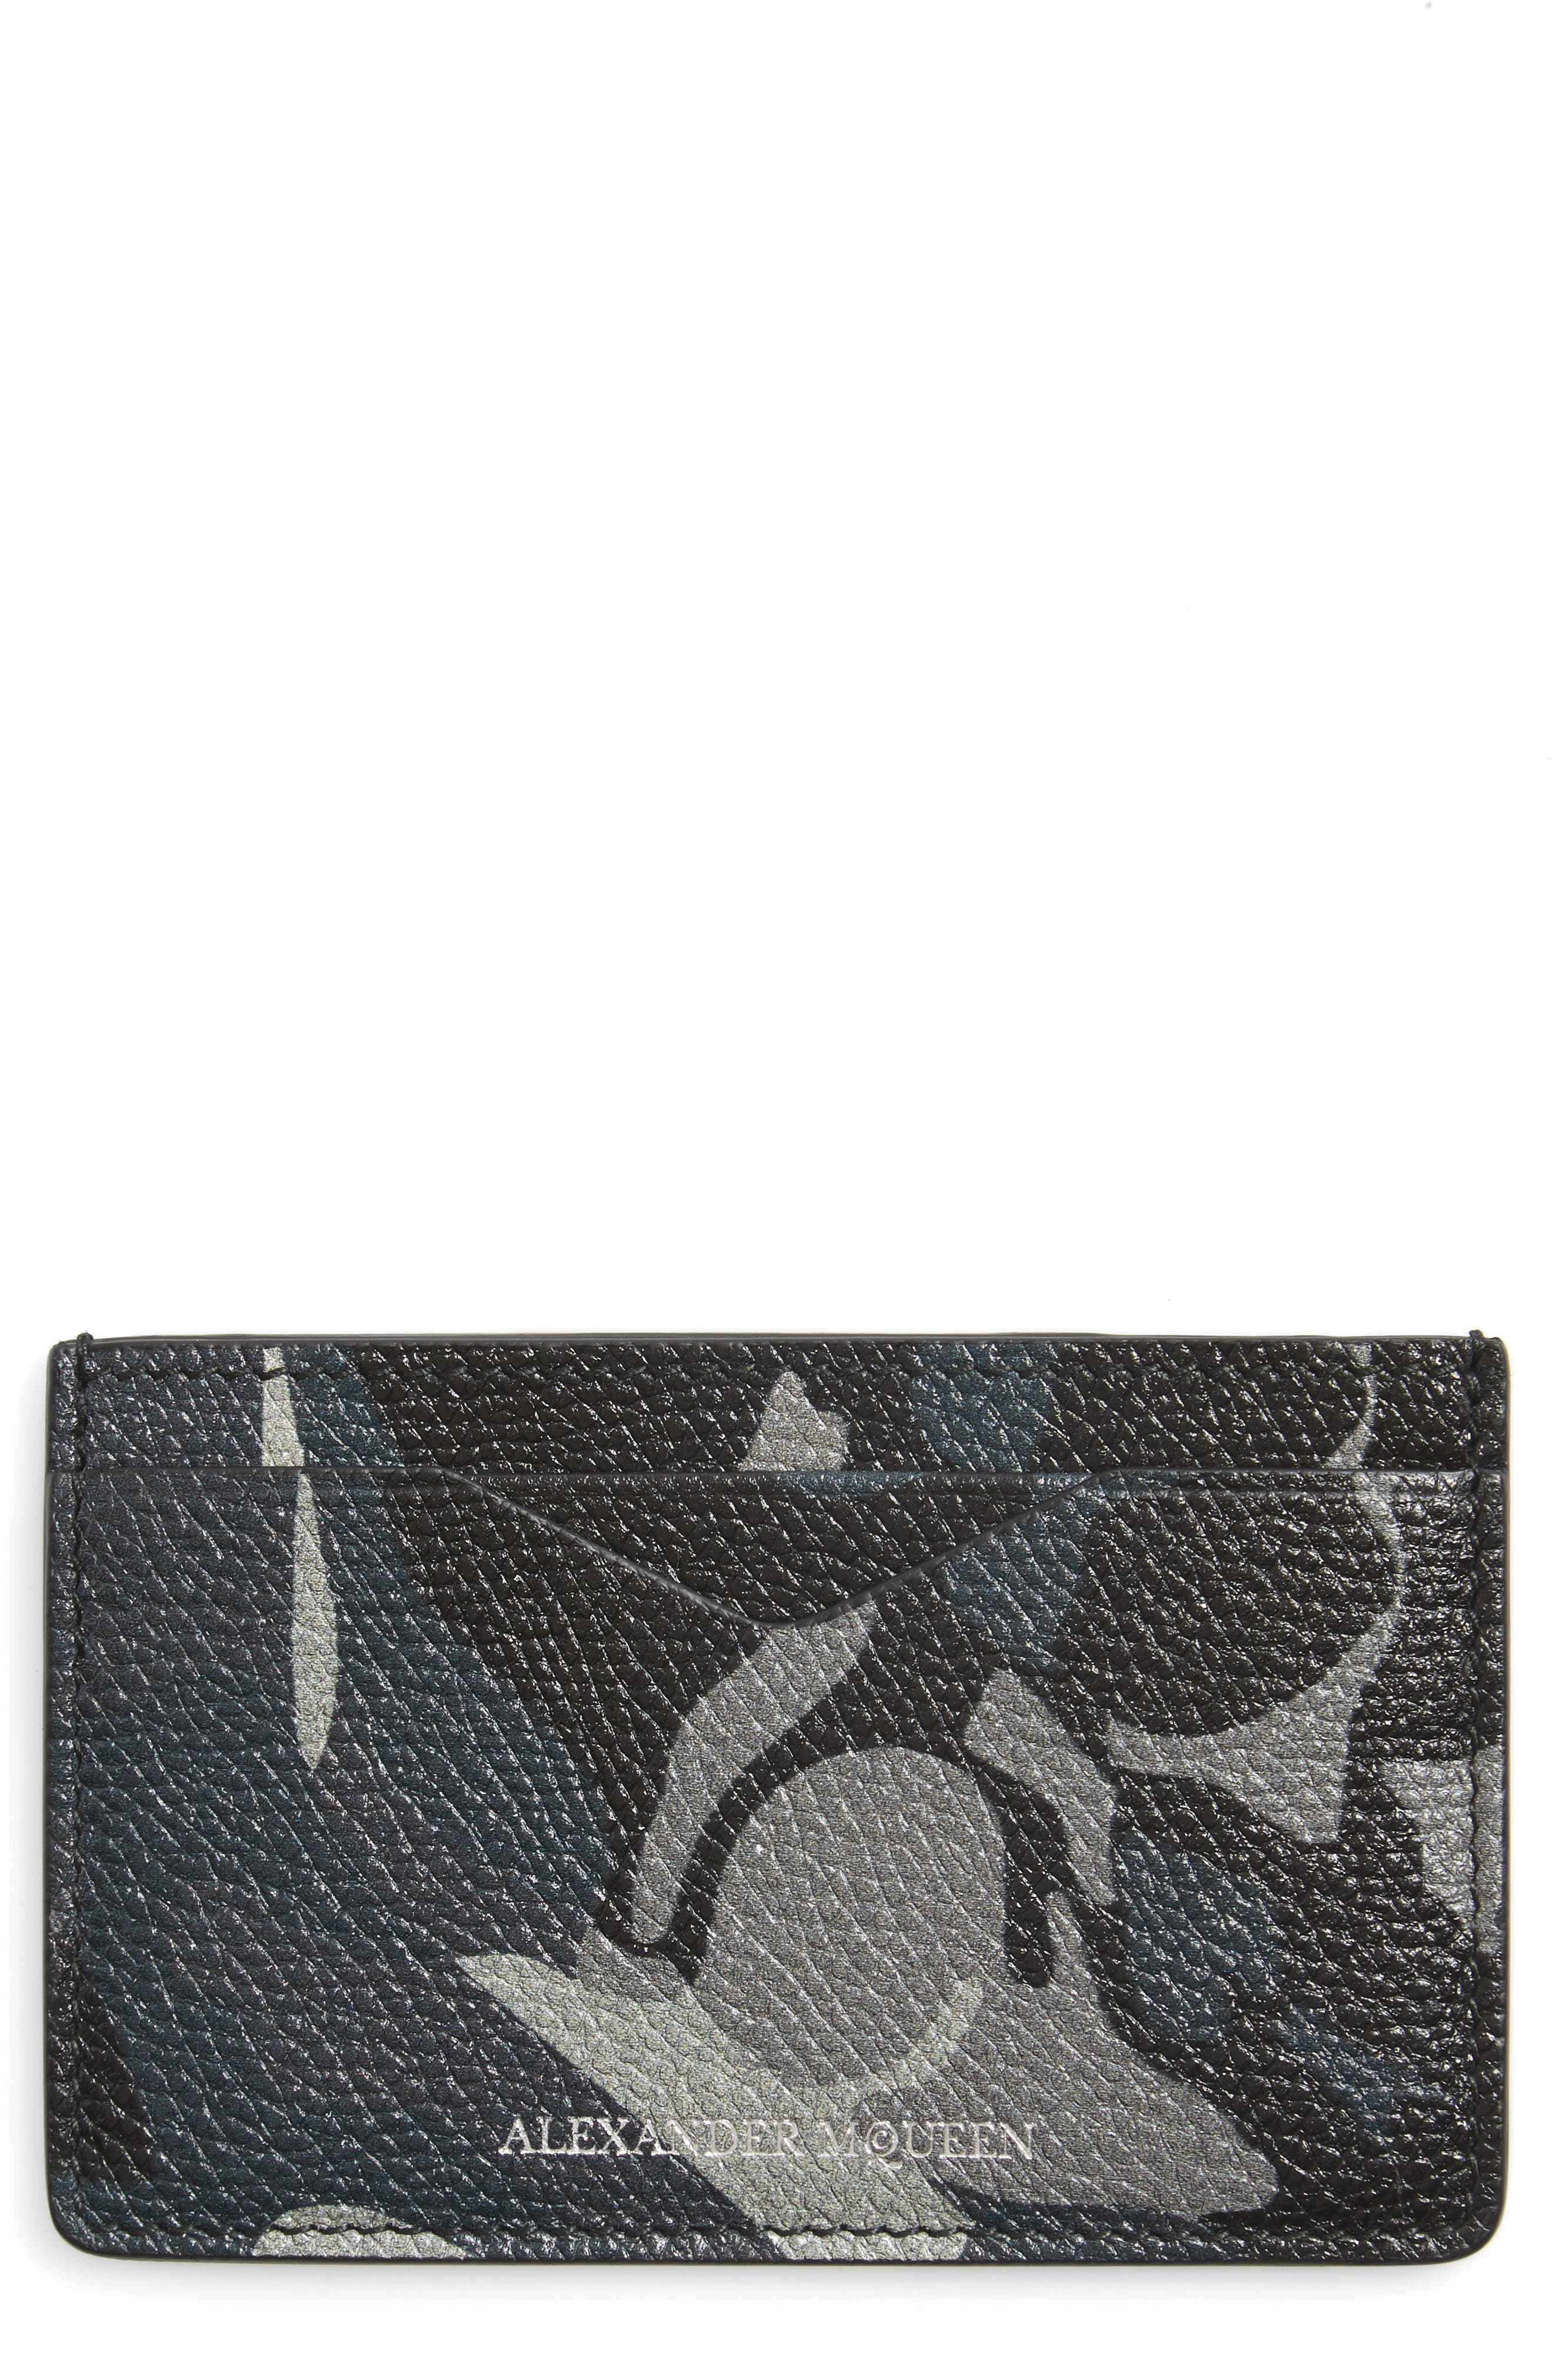 Camo Leather Card Case,                         Main,                         color, 001